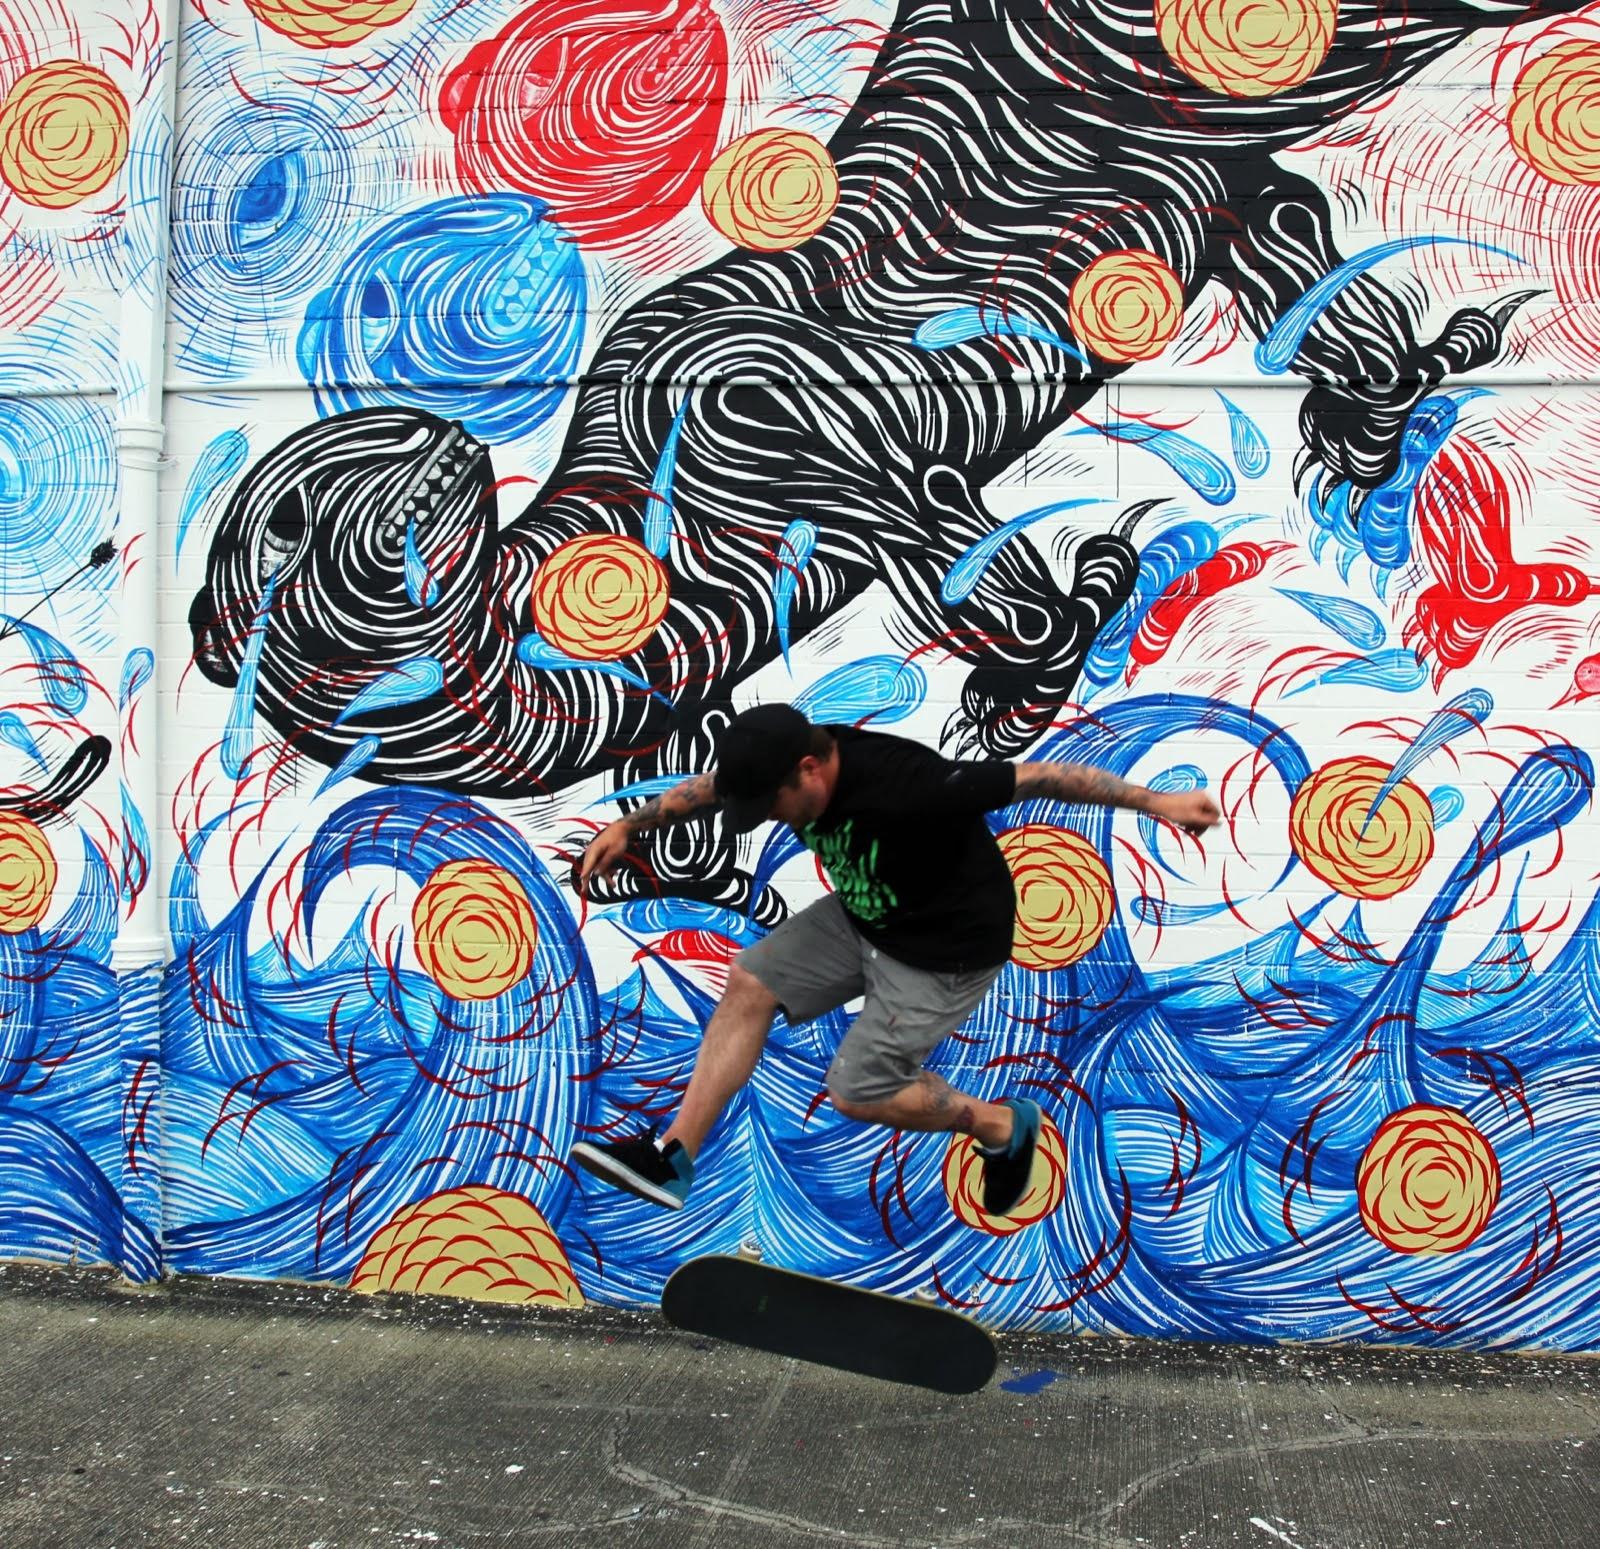 Andrew Schoultz New Mural For POW! WOW! 2014 - Honolulu, Hawaii